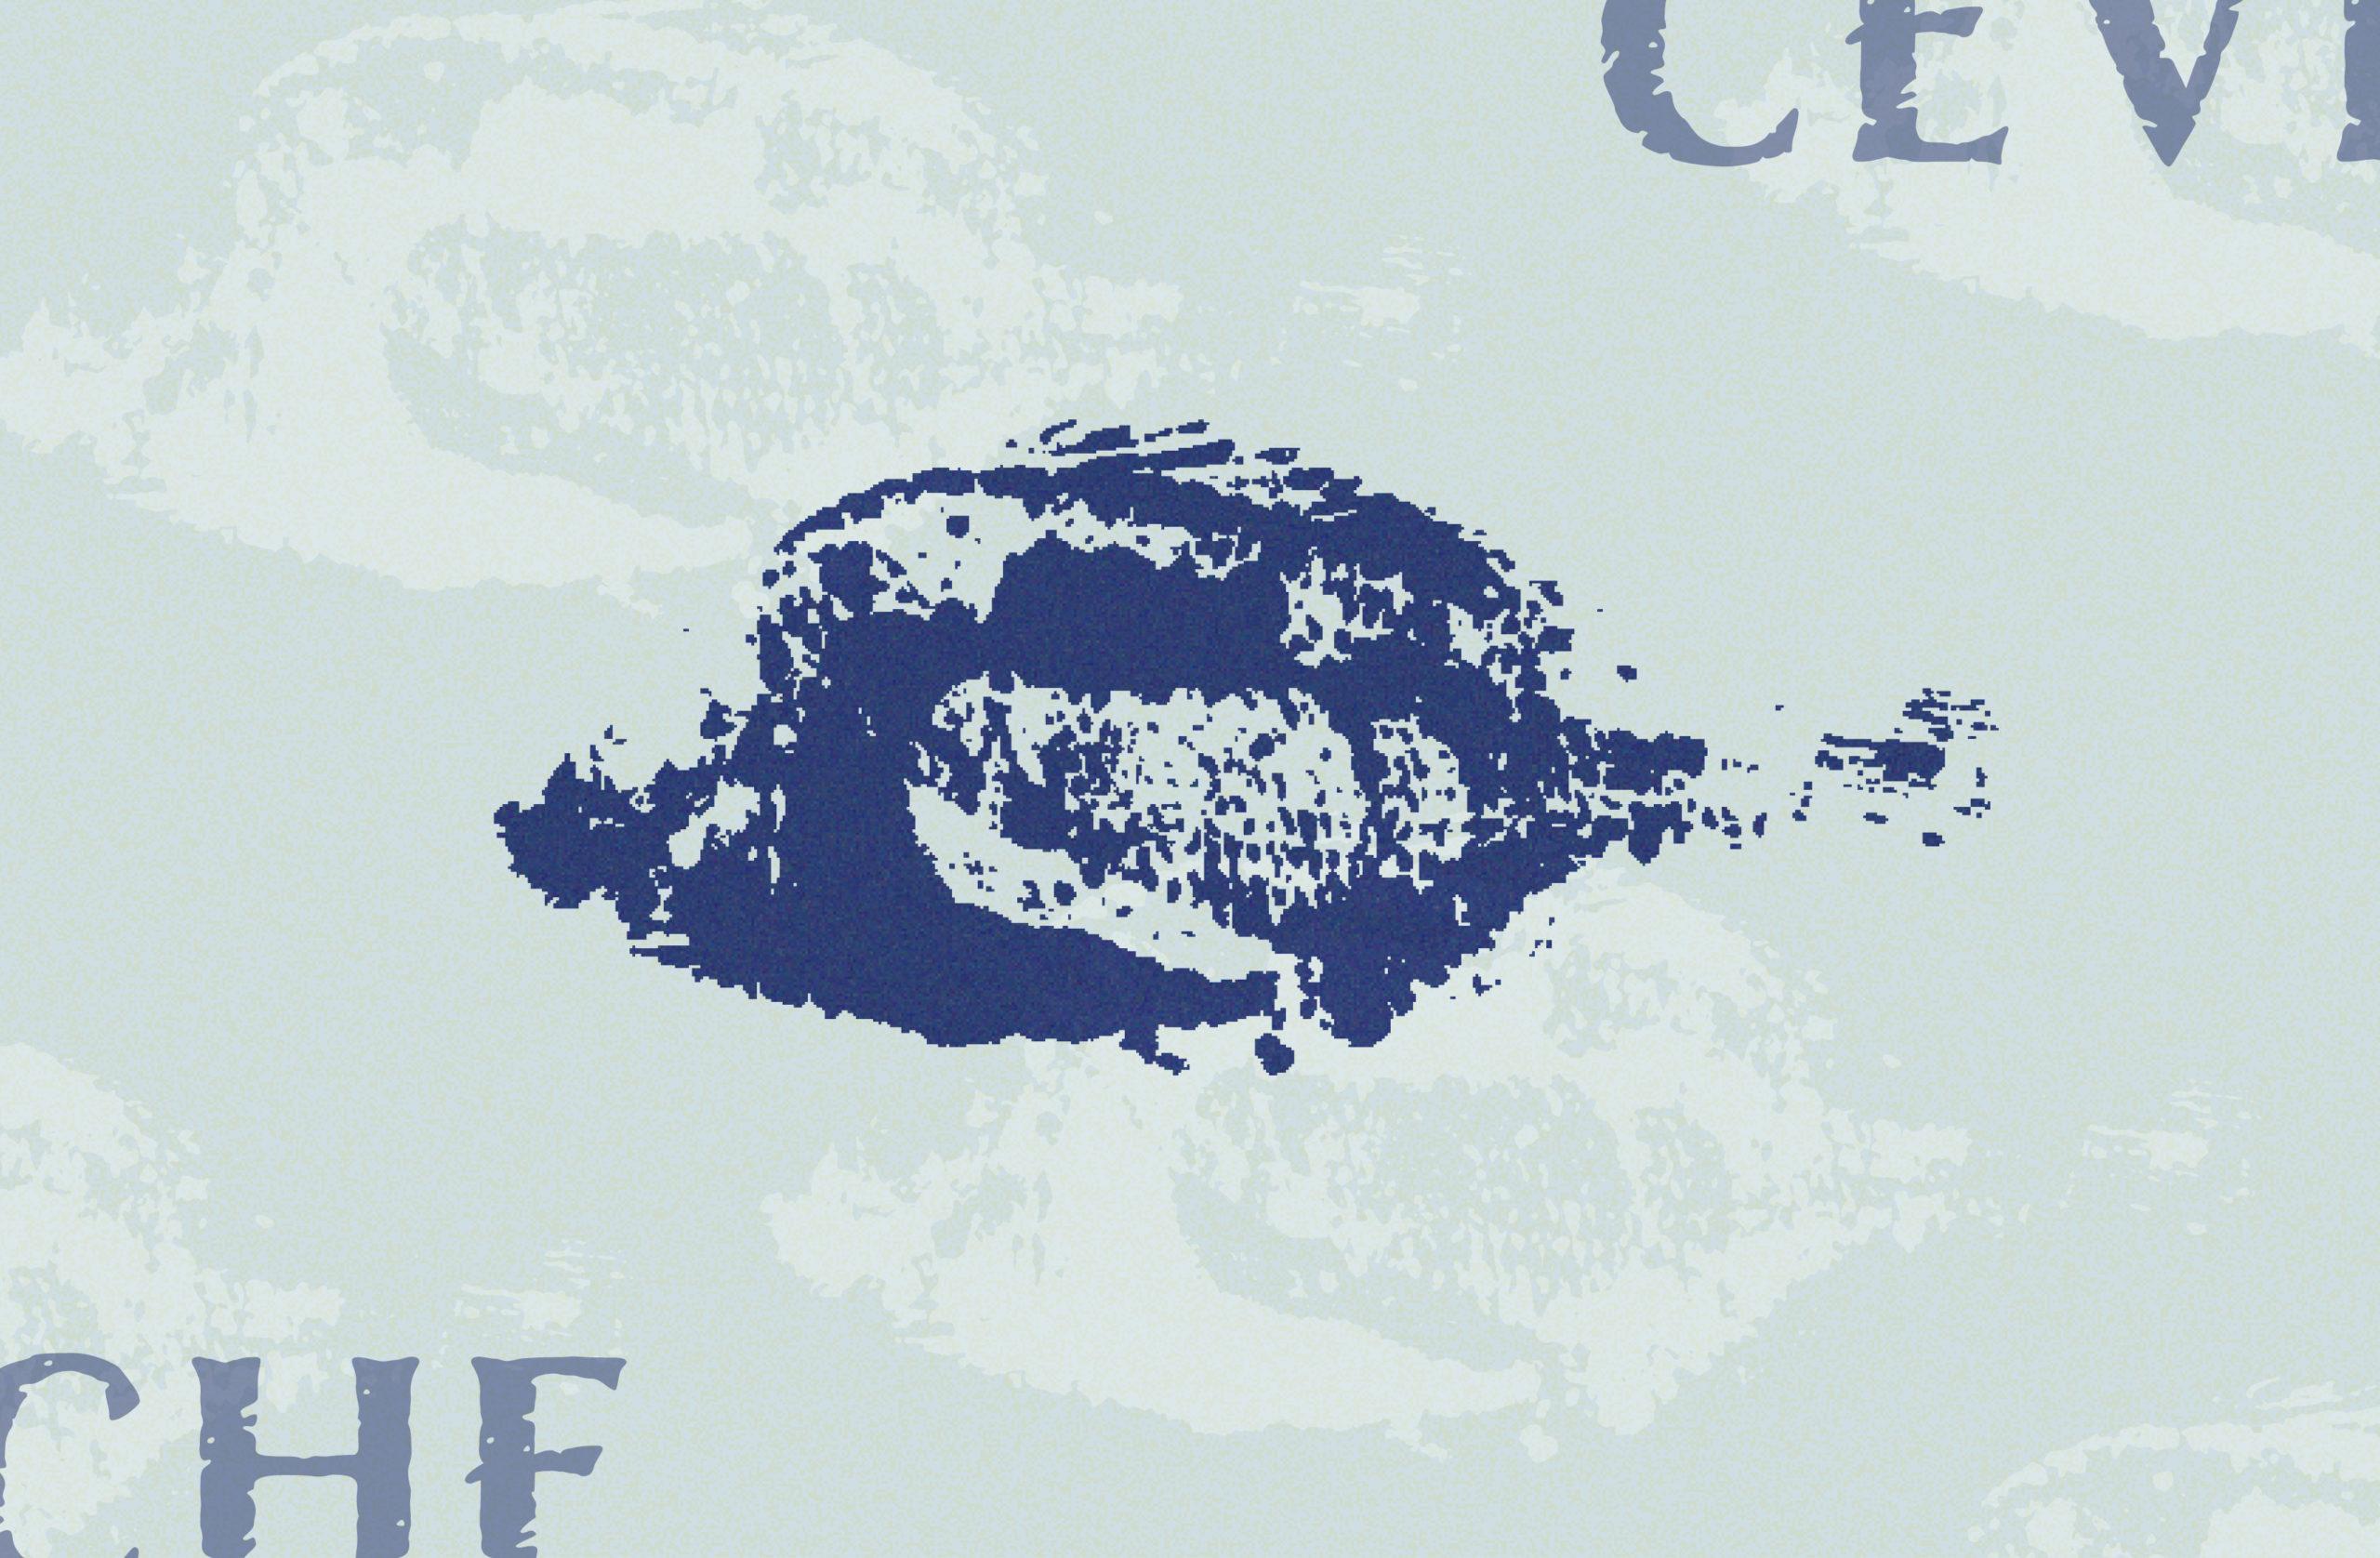 Cevicheria Illary restaurant logo design8